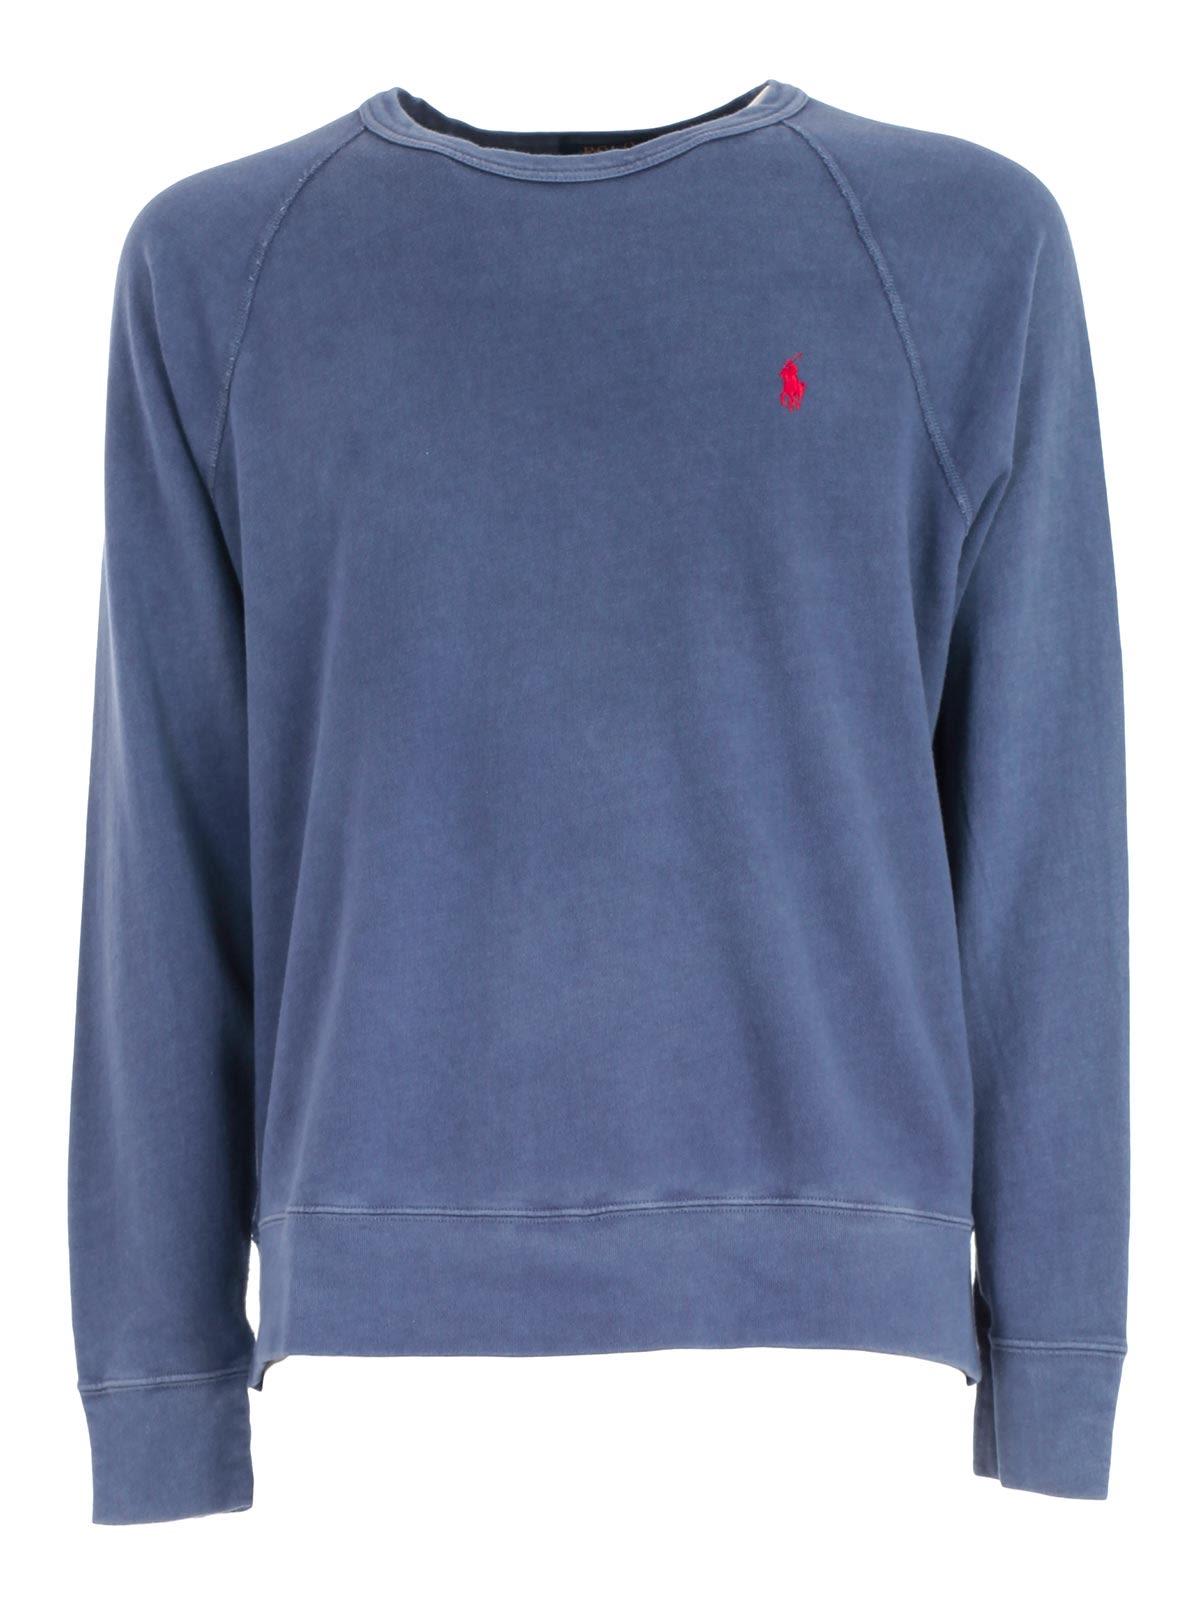 Sweatshirt Polo Ralph Lauren Lightweight Lightweight Sweatshirt Polo Ralph Lauren 7f6Ygyvb